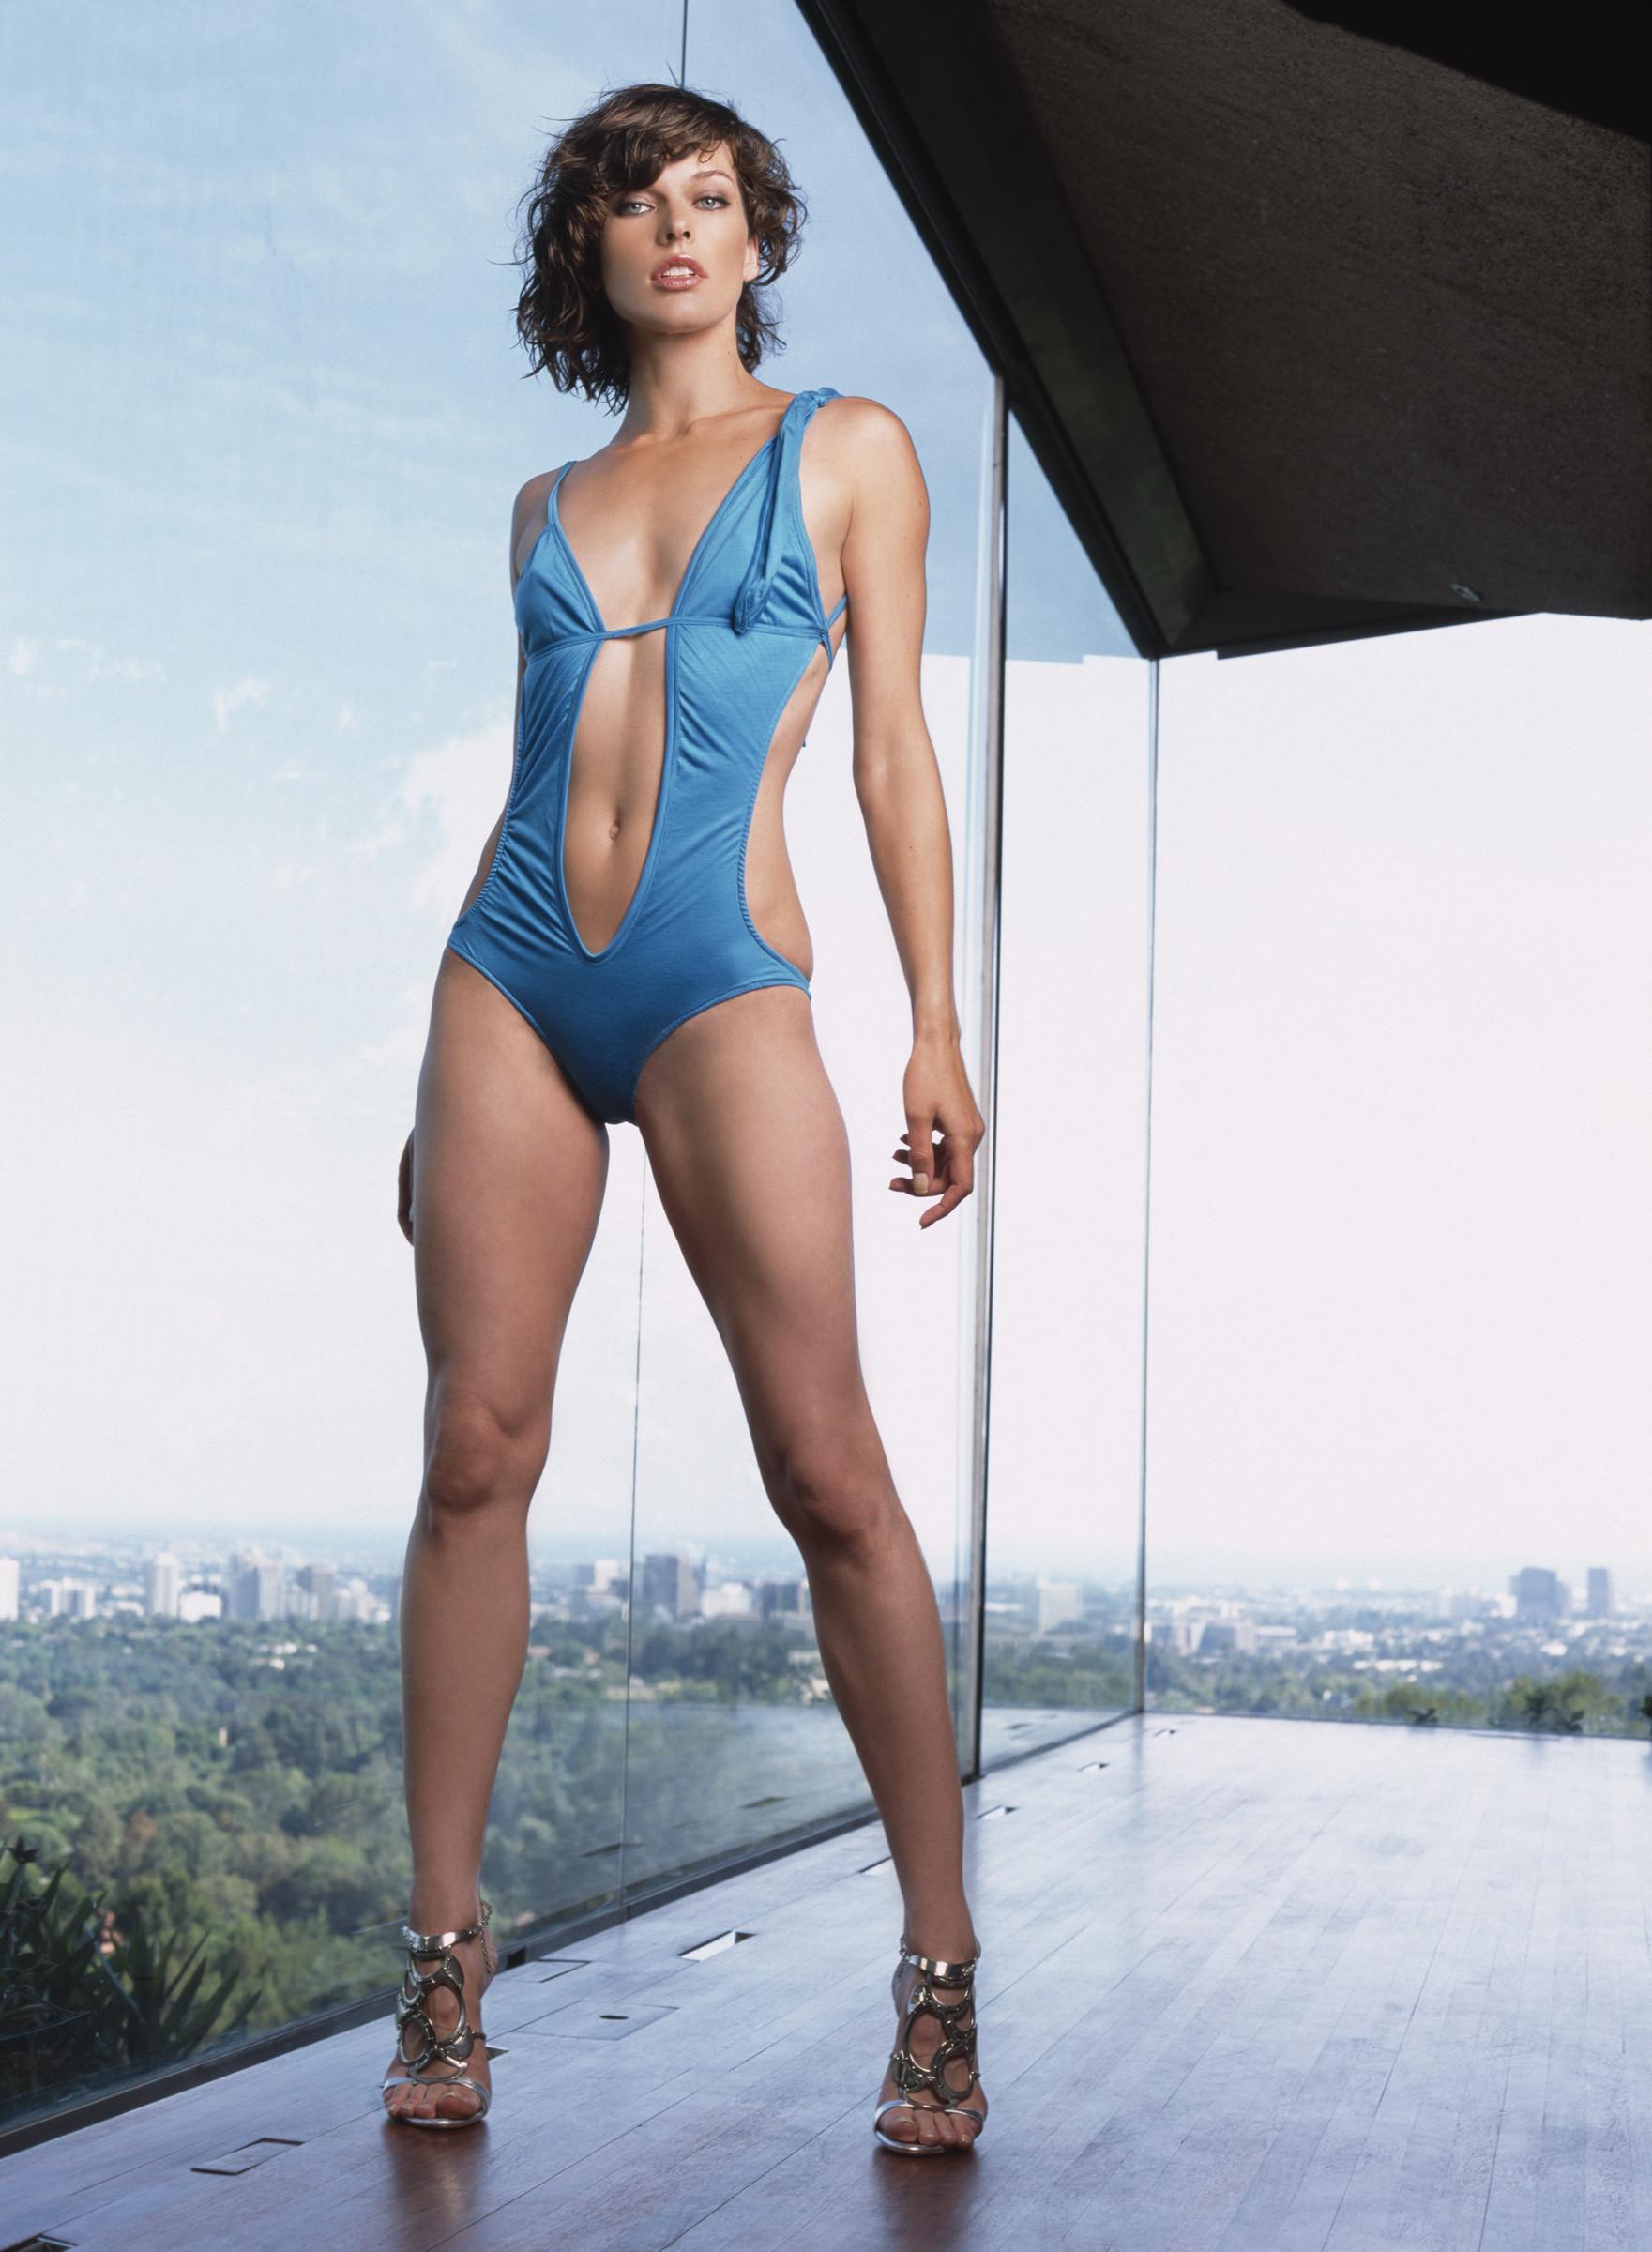 Milla jovovich pictures sosandranews - Div style padding ...